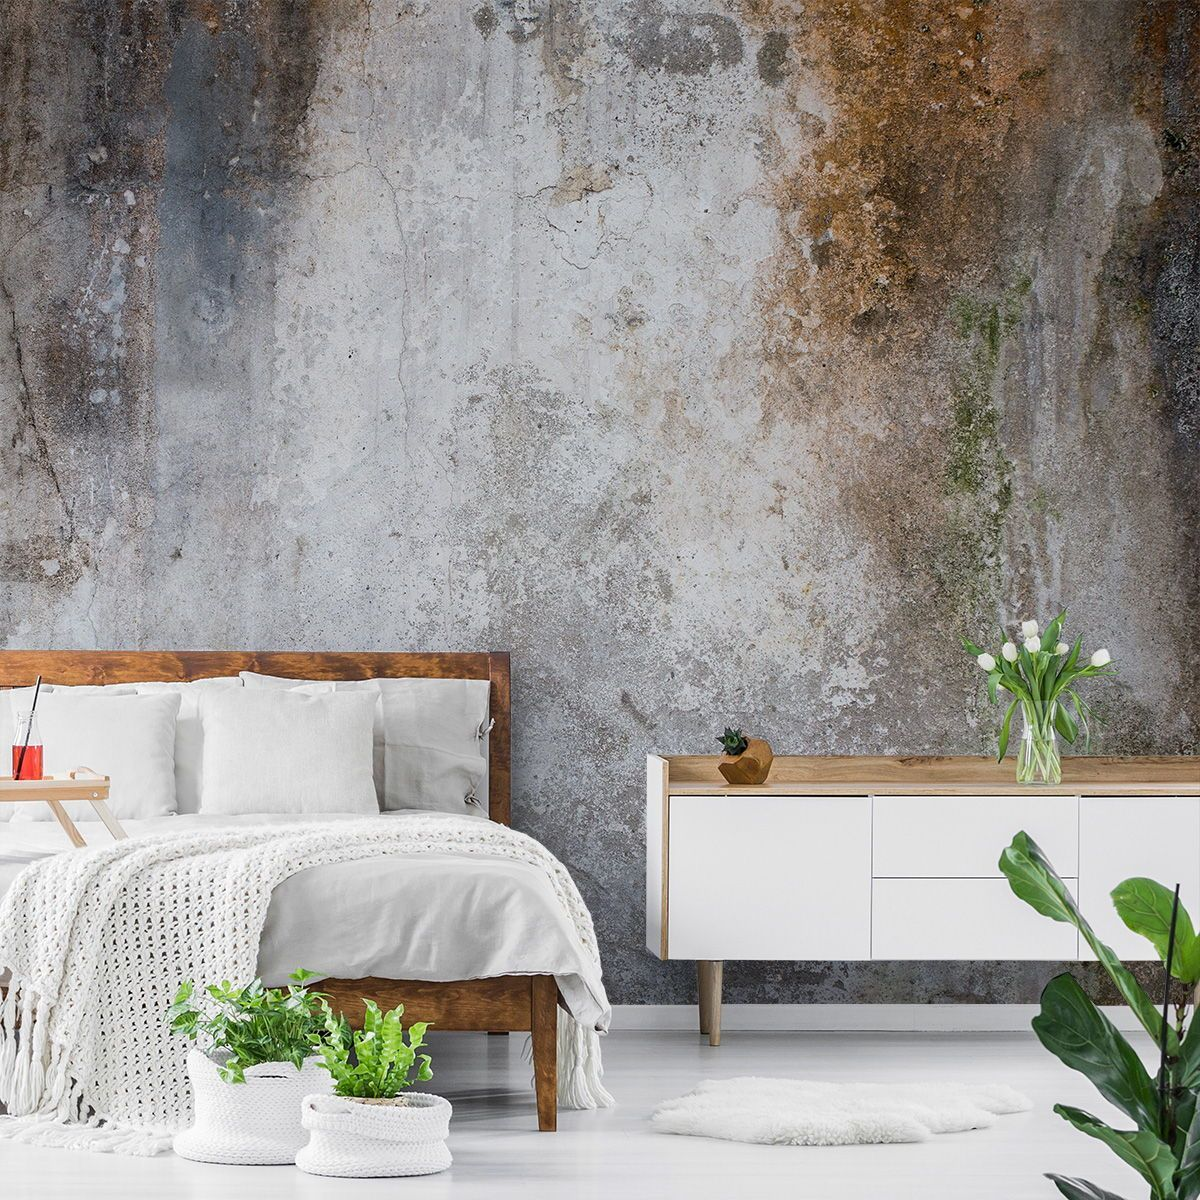 Aged Concrete Wallpaper Wallsauce Eu In 2020 Concrete Wallpaper Room Textured Wallpaper